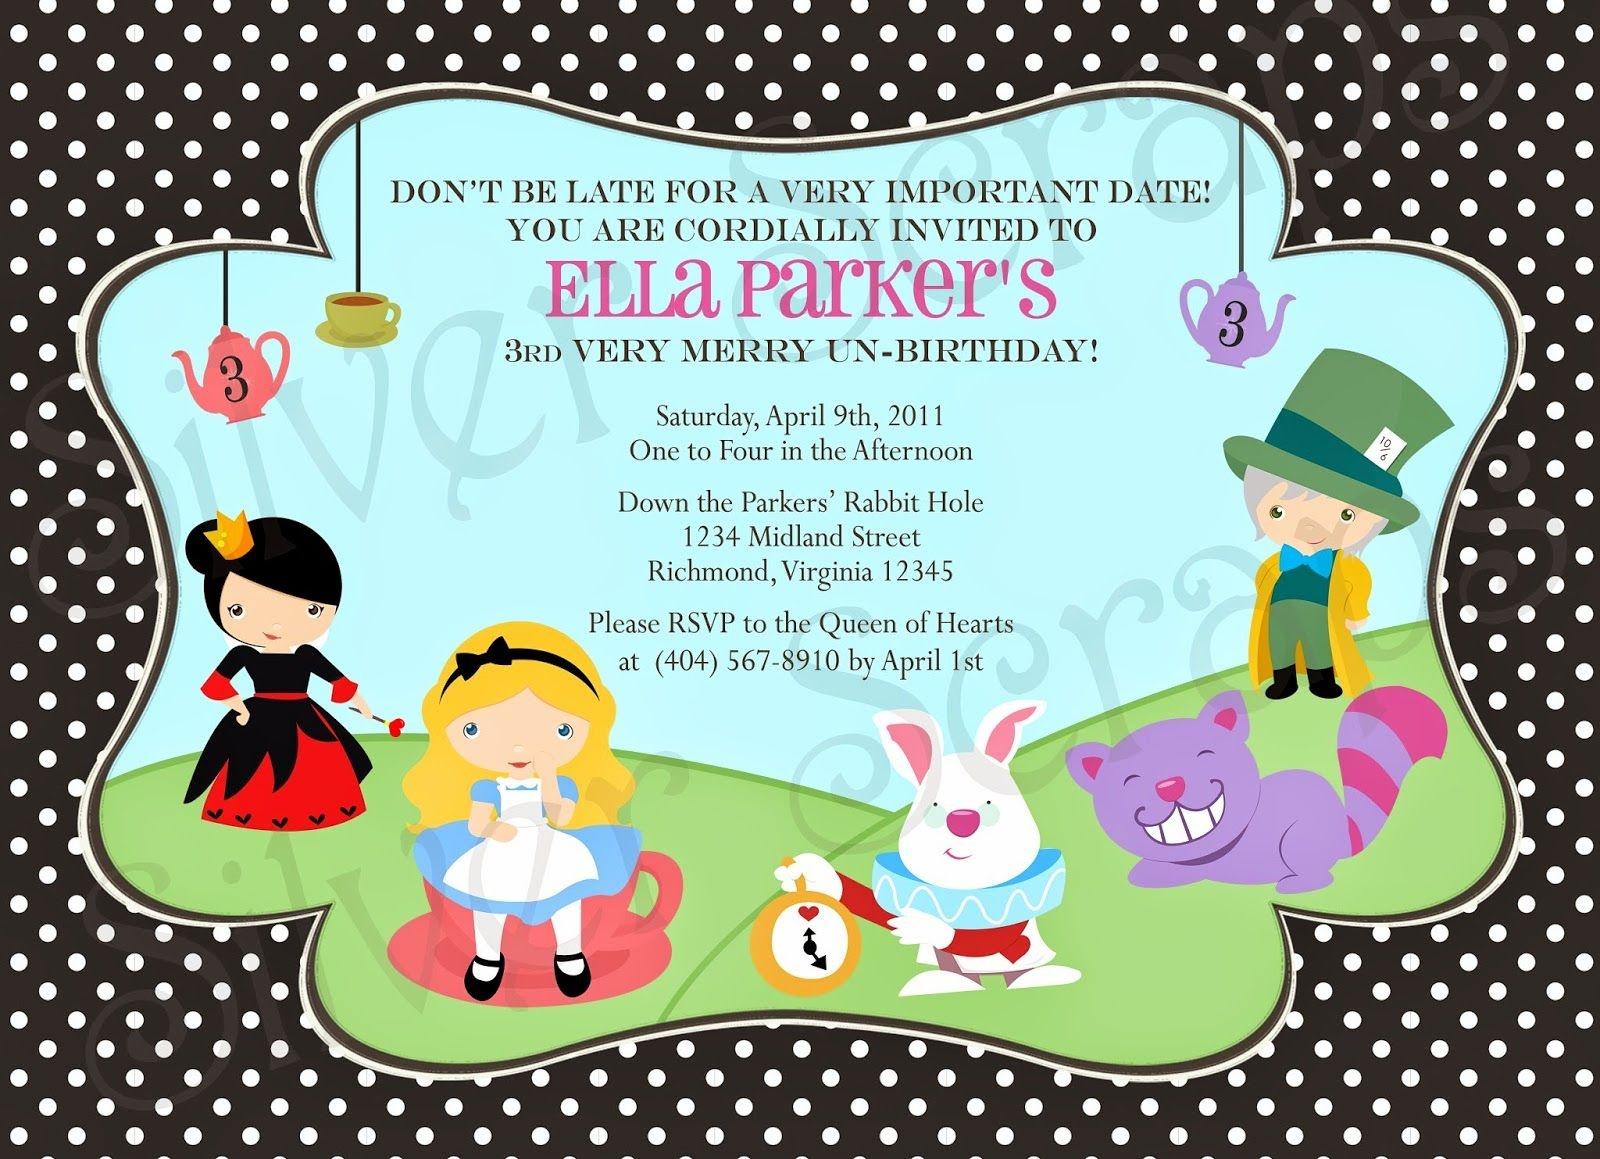 Alice In Wonderland Birthday Invitations Free Printable | Alice - Mad Hatter Tea Party Invitations Free Printable